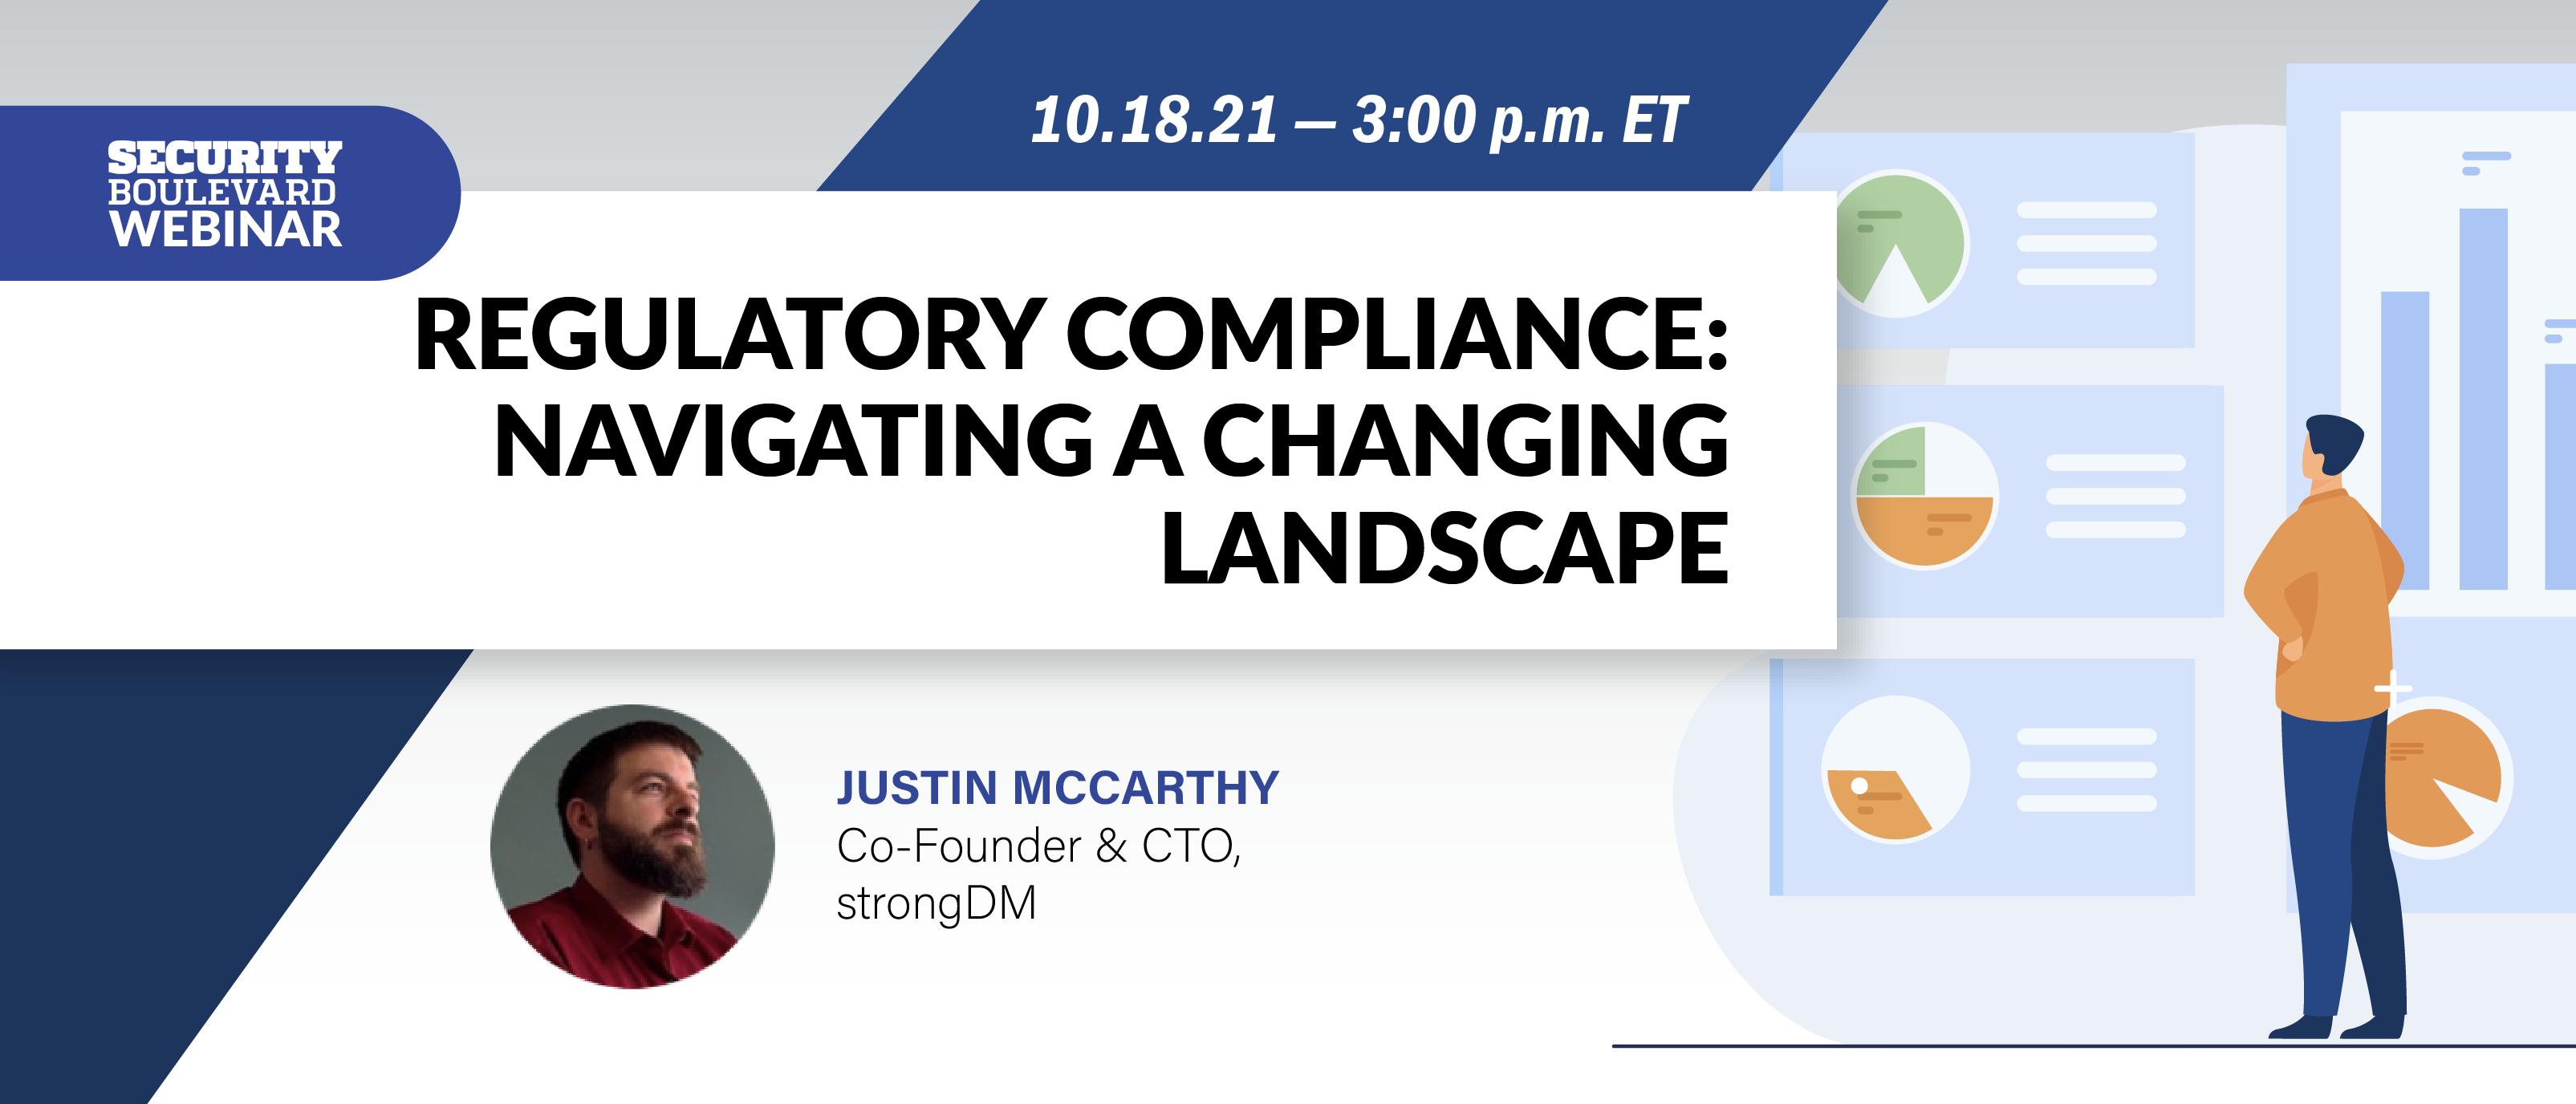 Regulatory Compliance: Navigating a Changing Landscape